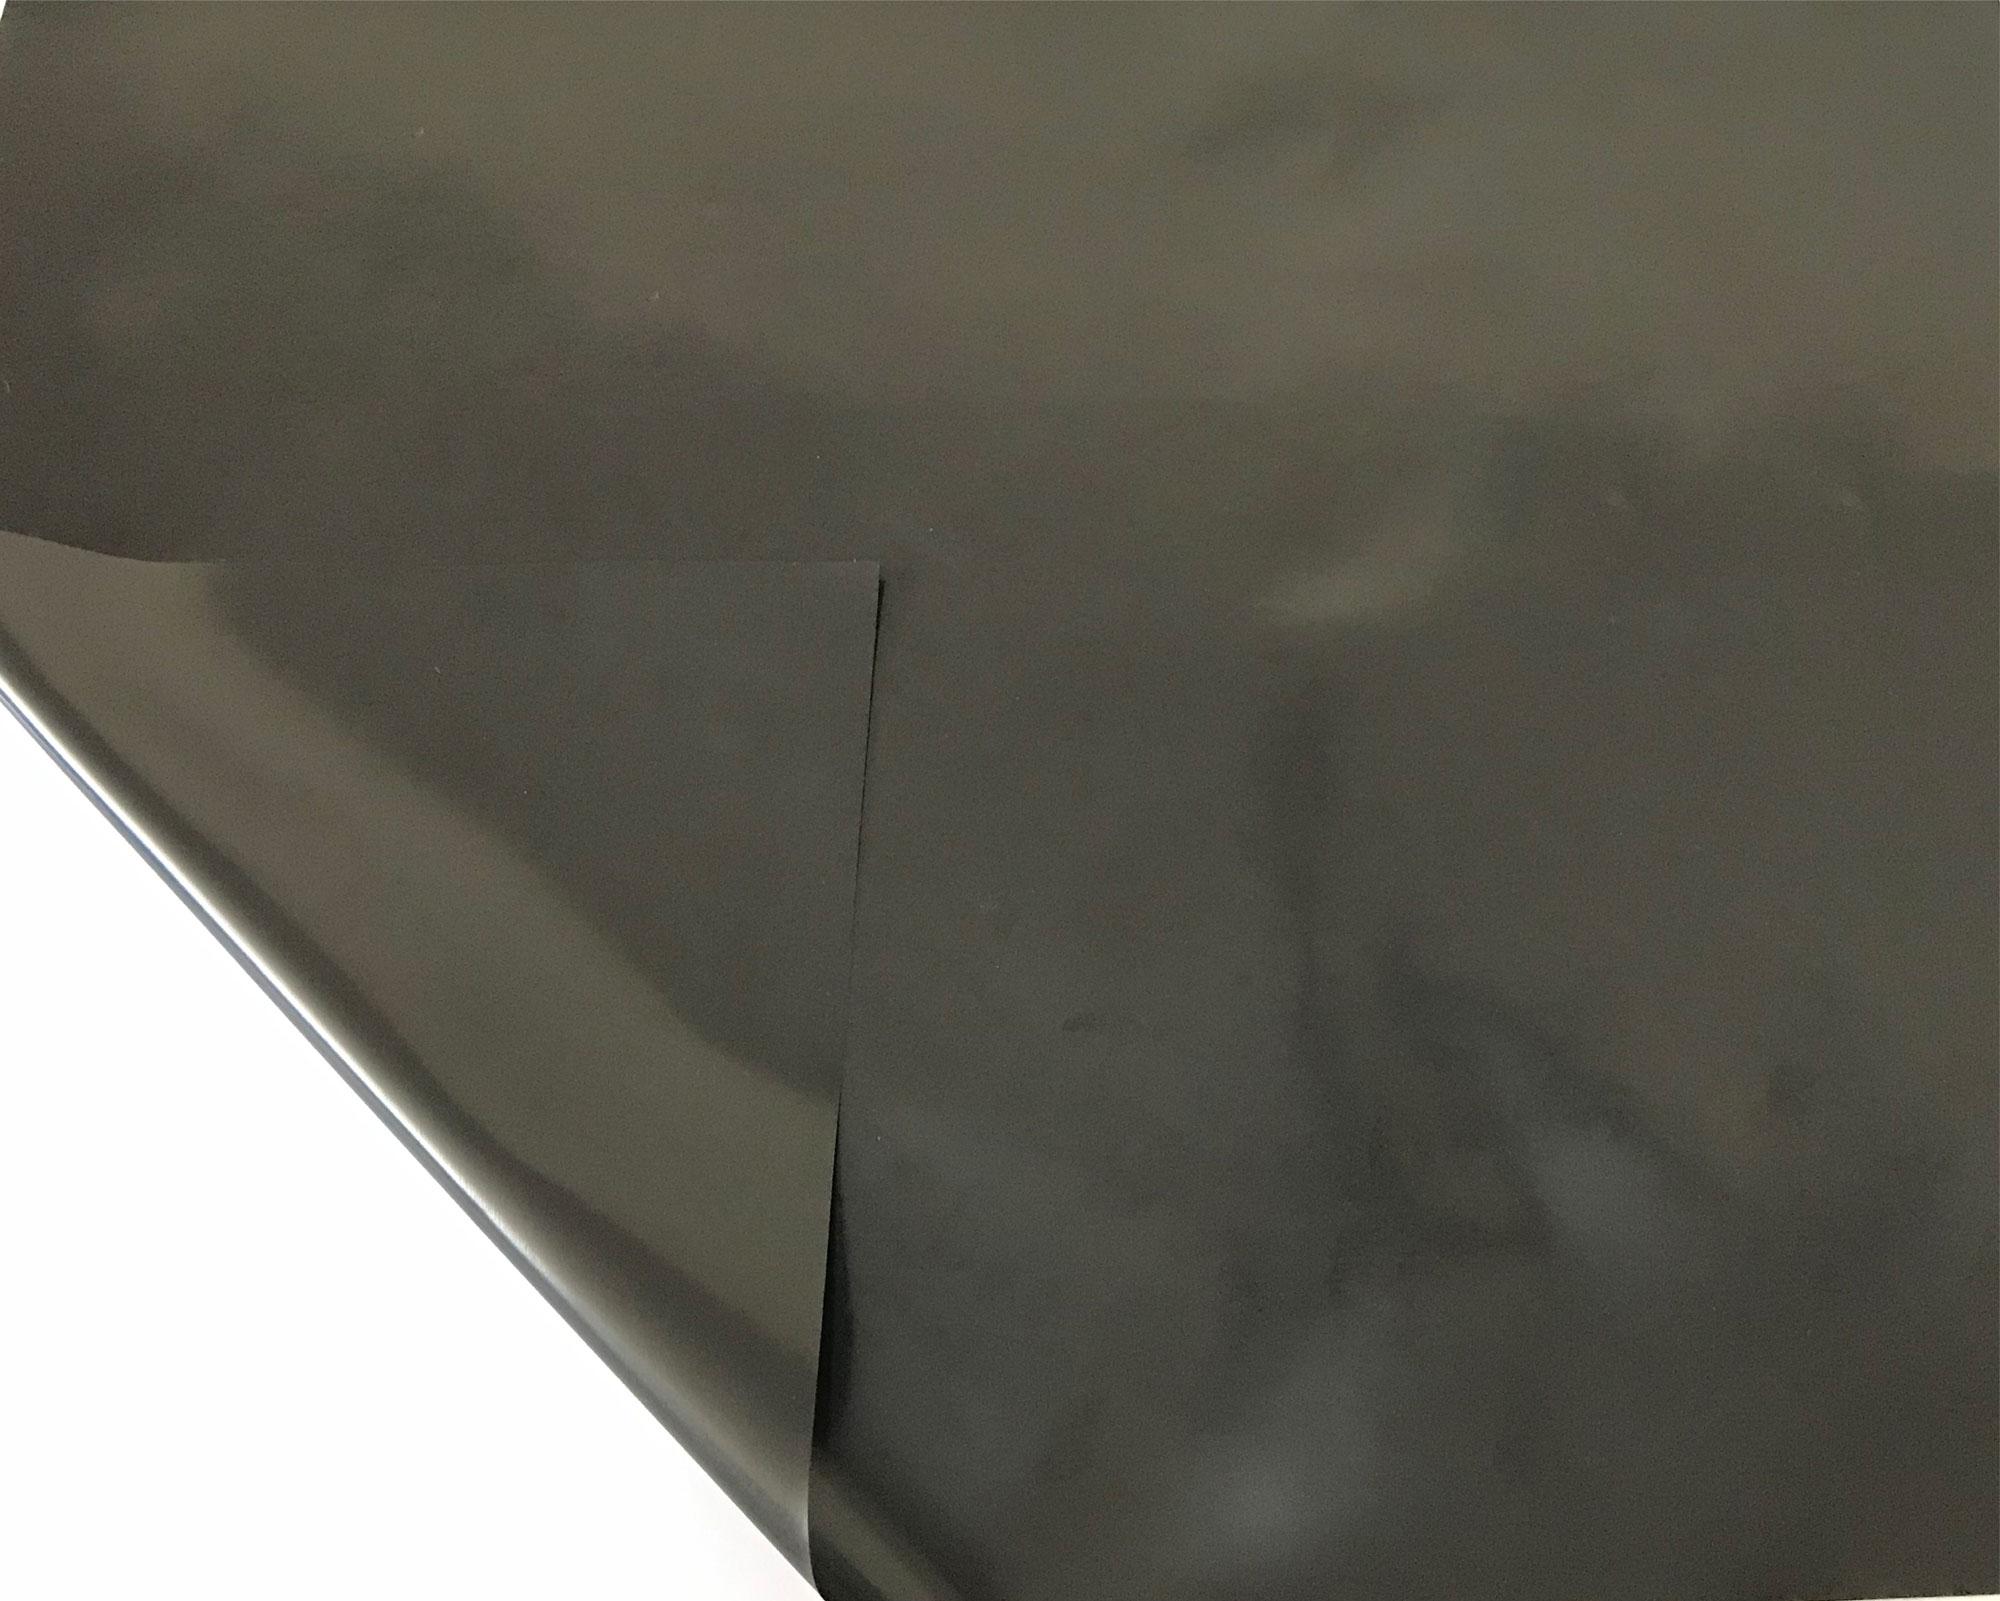 Lona Geomembrana + Manta Bidim 300 Micras - 2x1,5